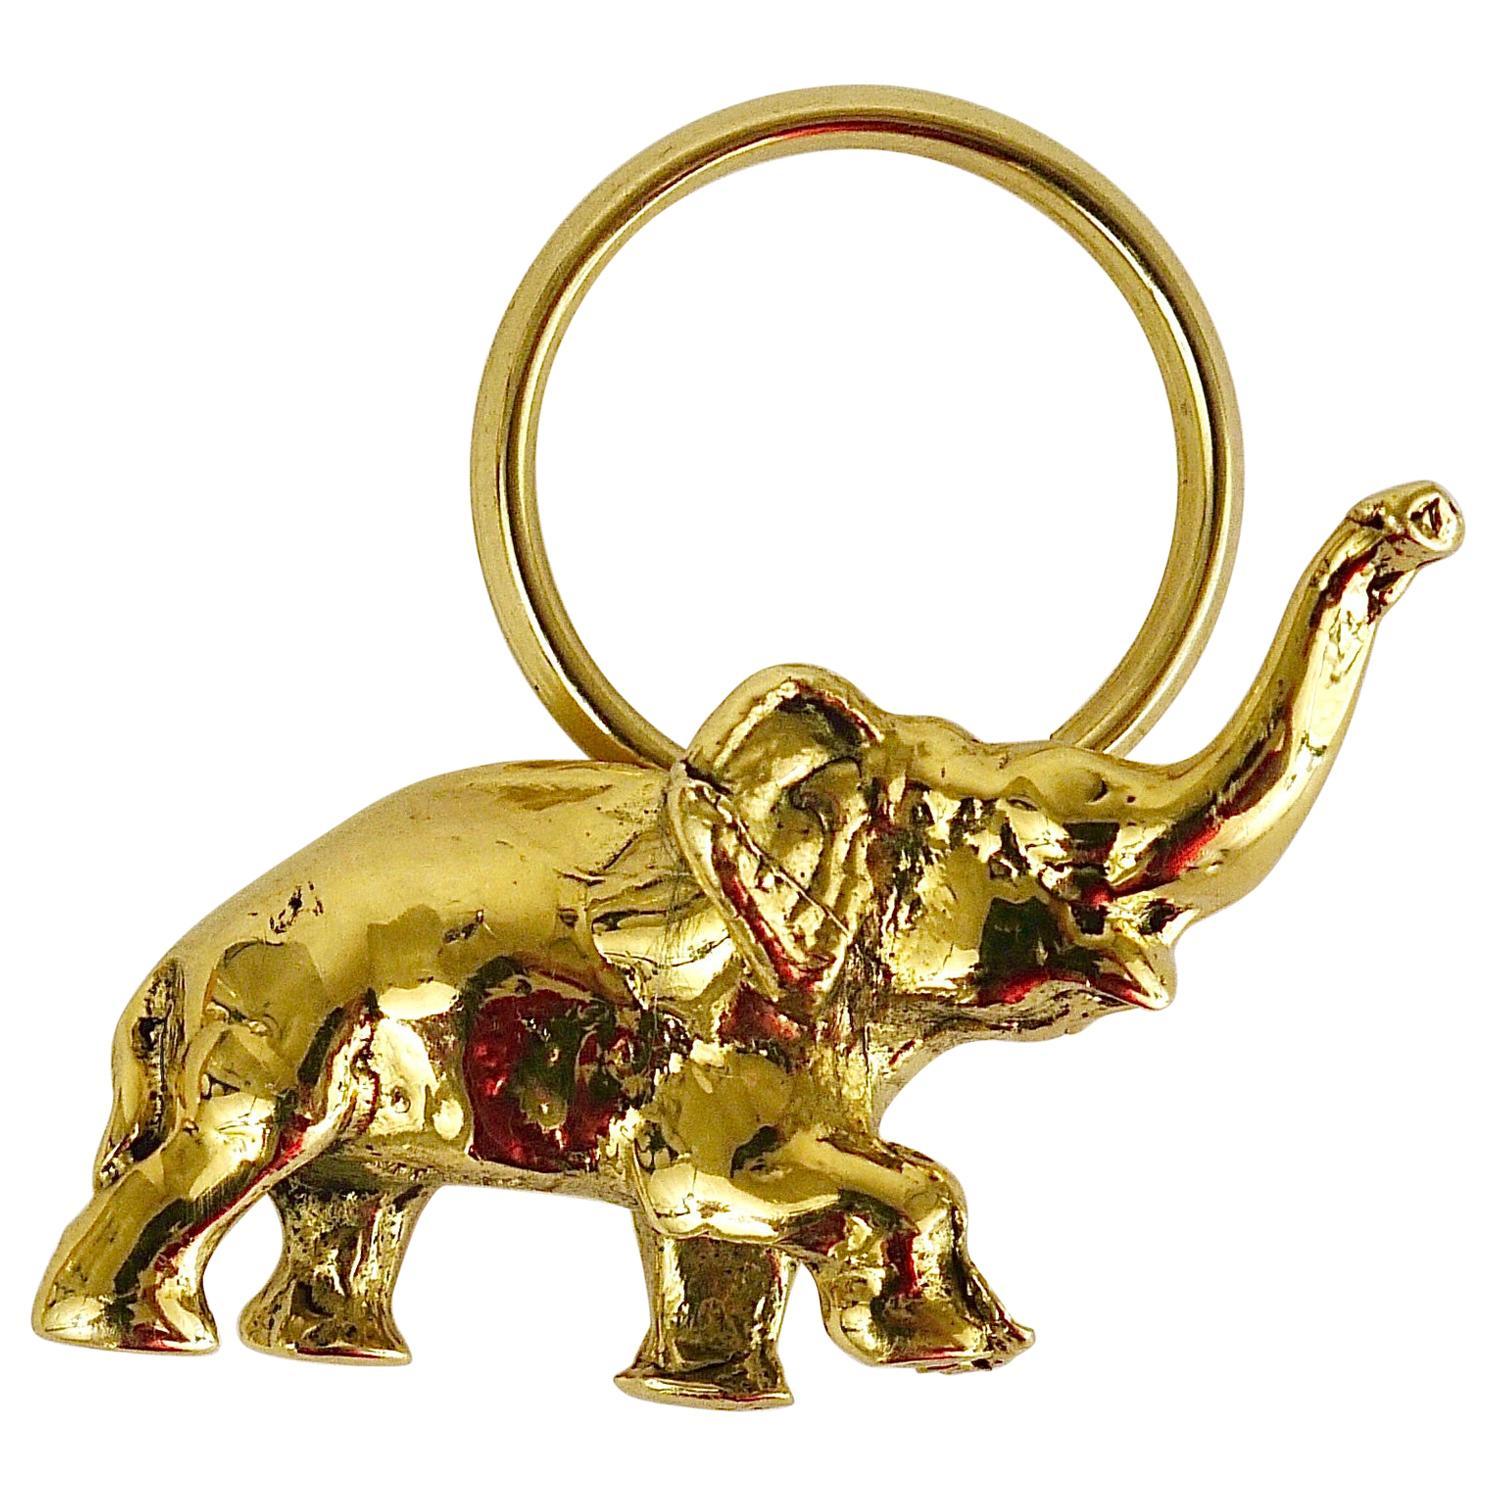 Carl Auböck Midcentury Elephant Handmade Brass Figurine Key Ring Chain Holder